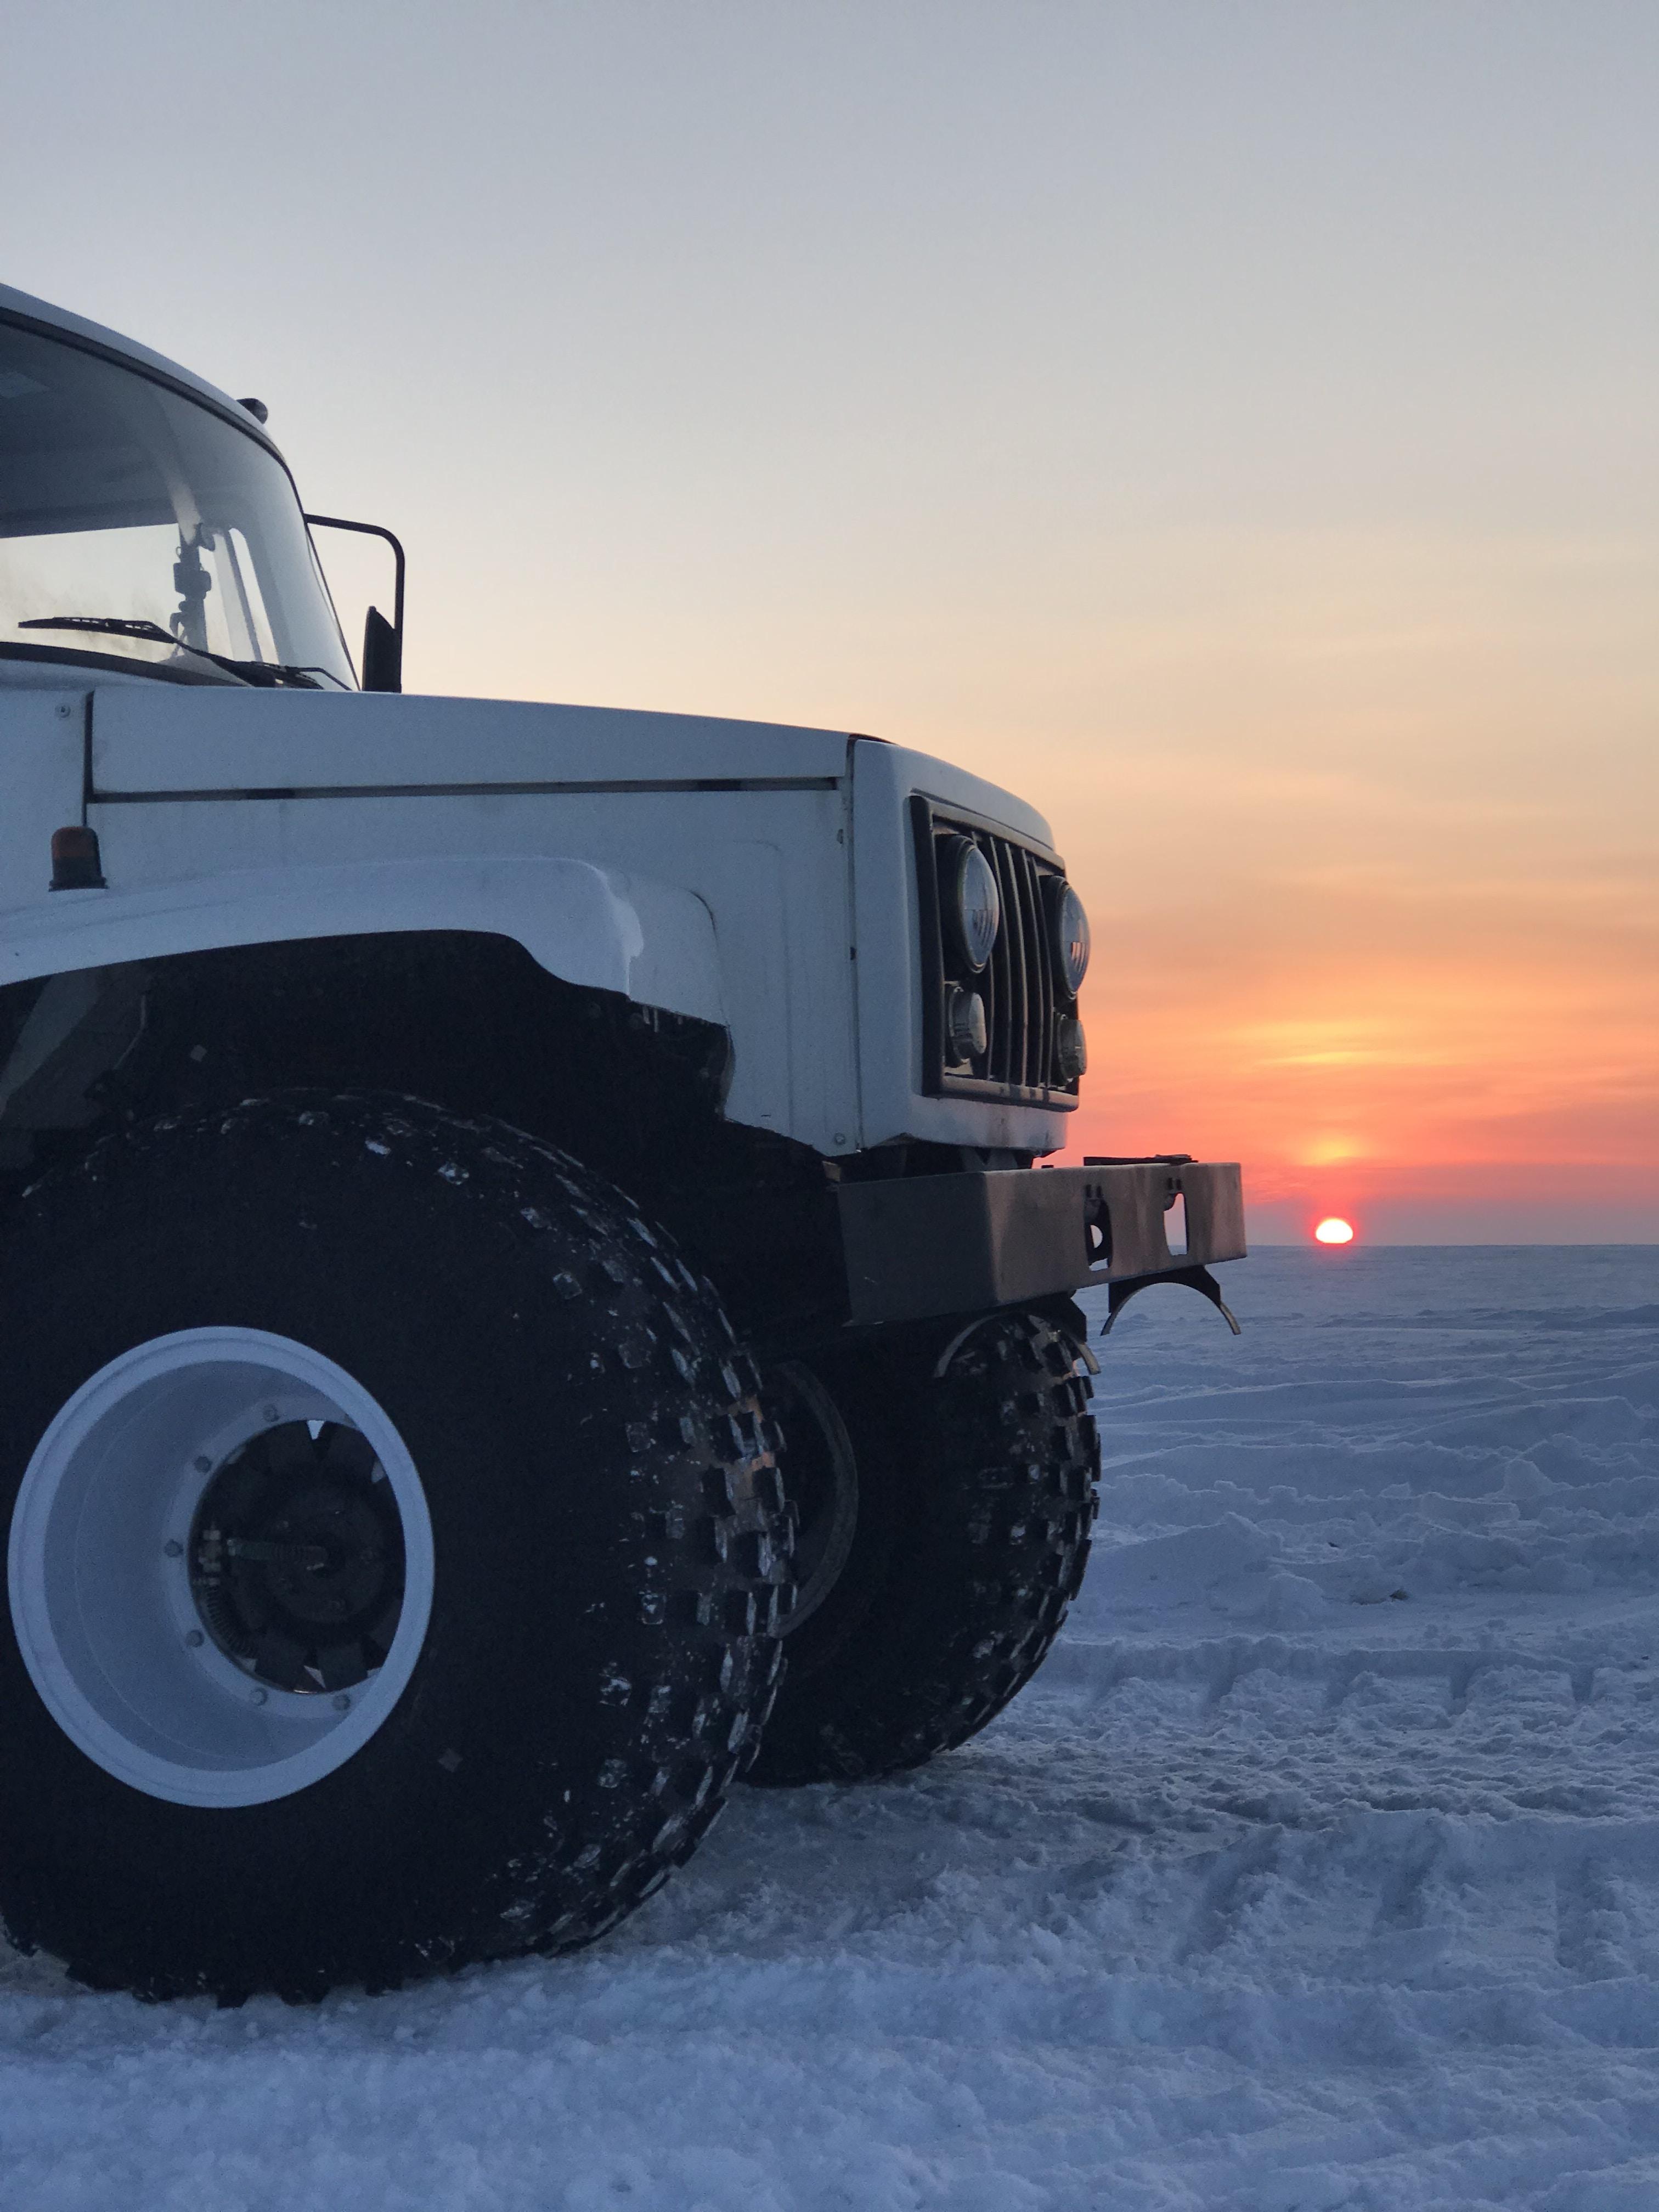 white vehicle parked on seashore with background of sunset